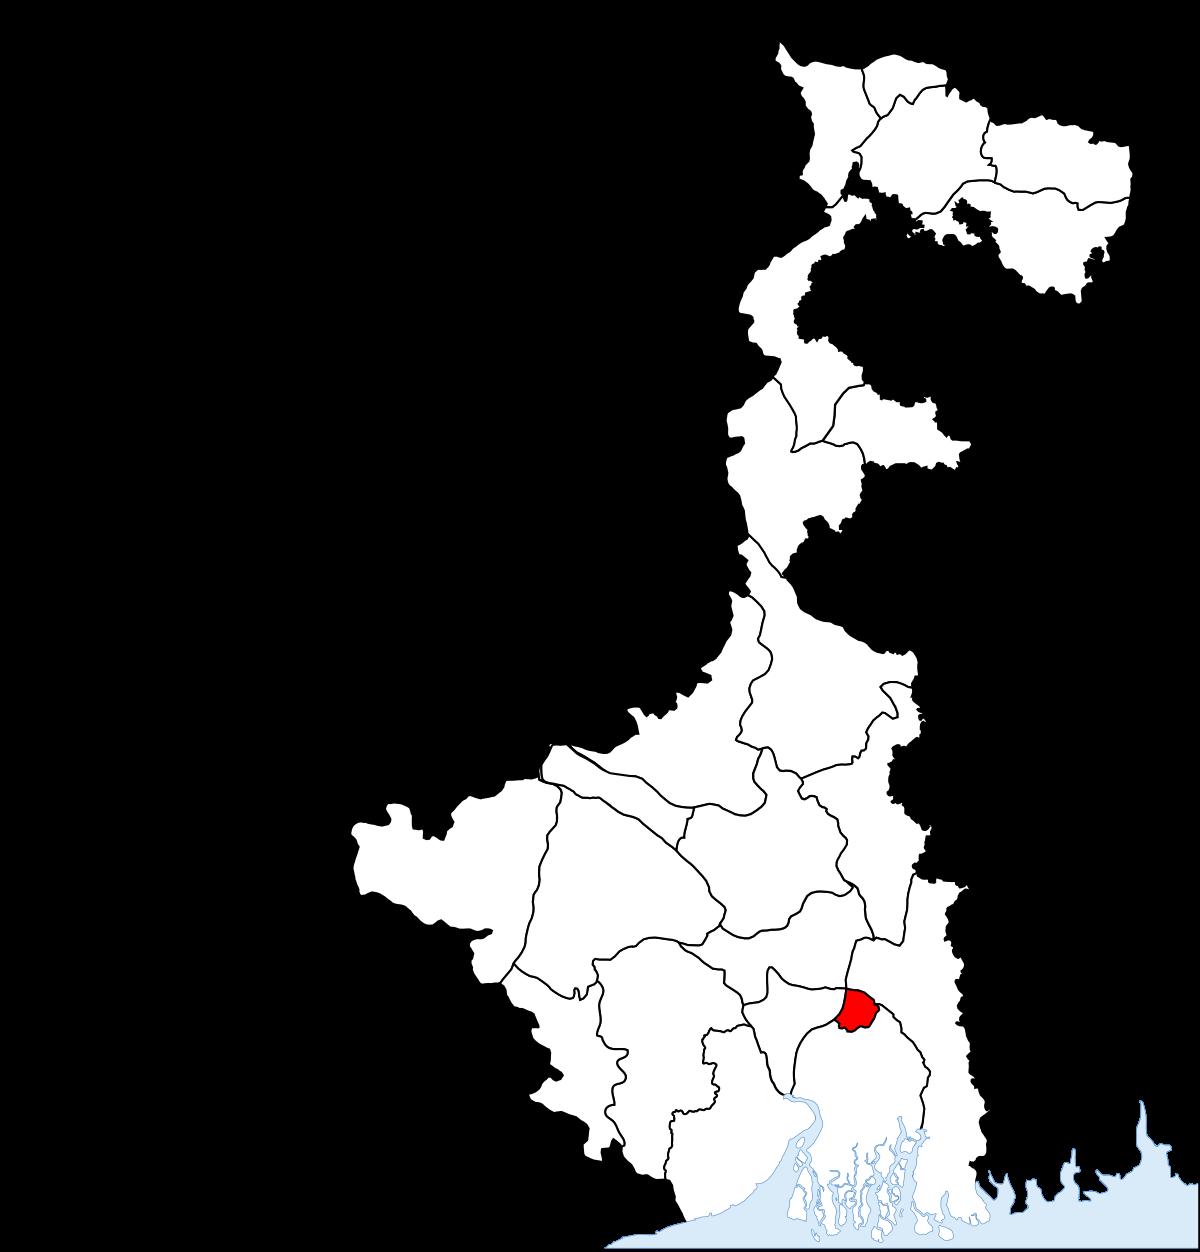 Kolkata district wikipedia . Maps clipart neighbourhood map